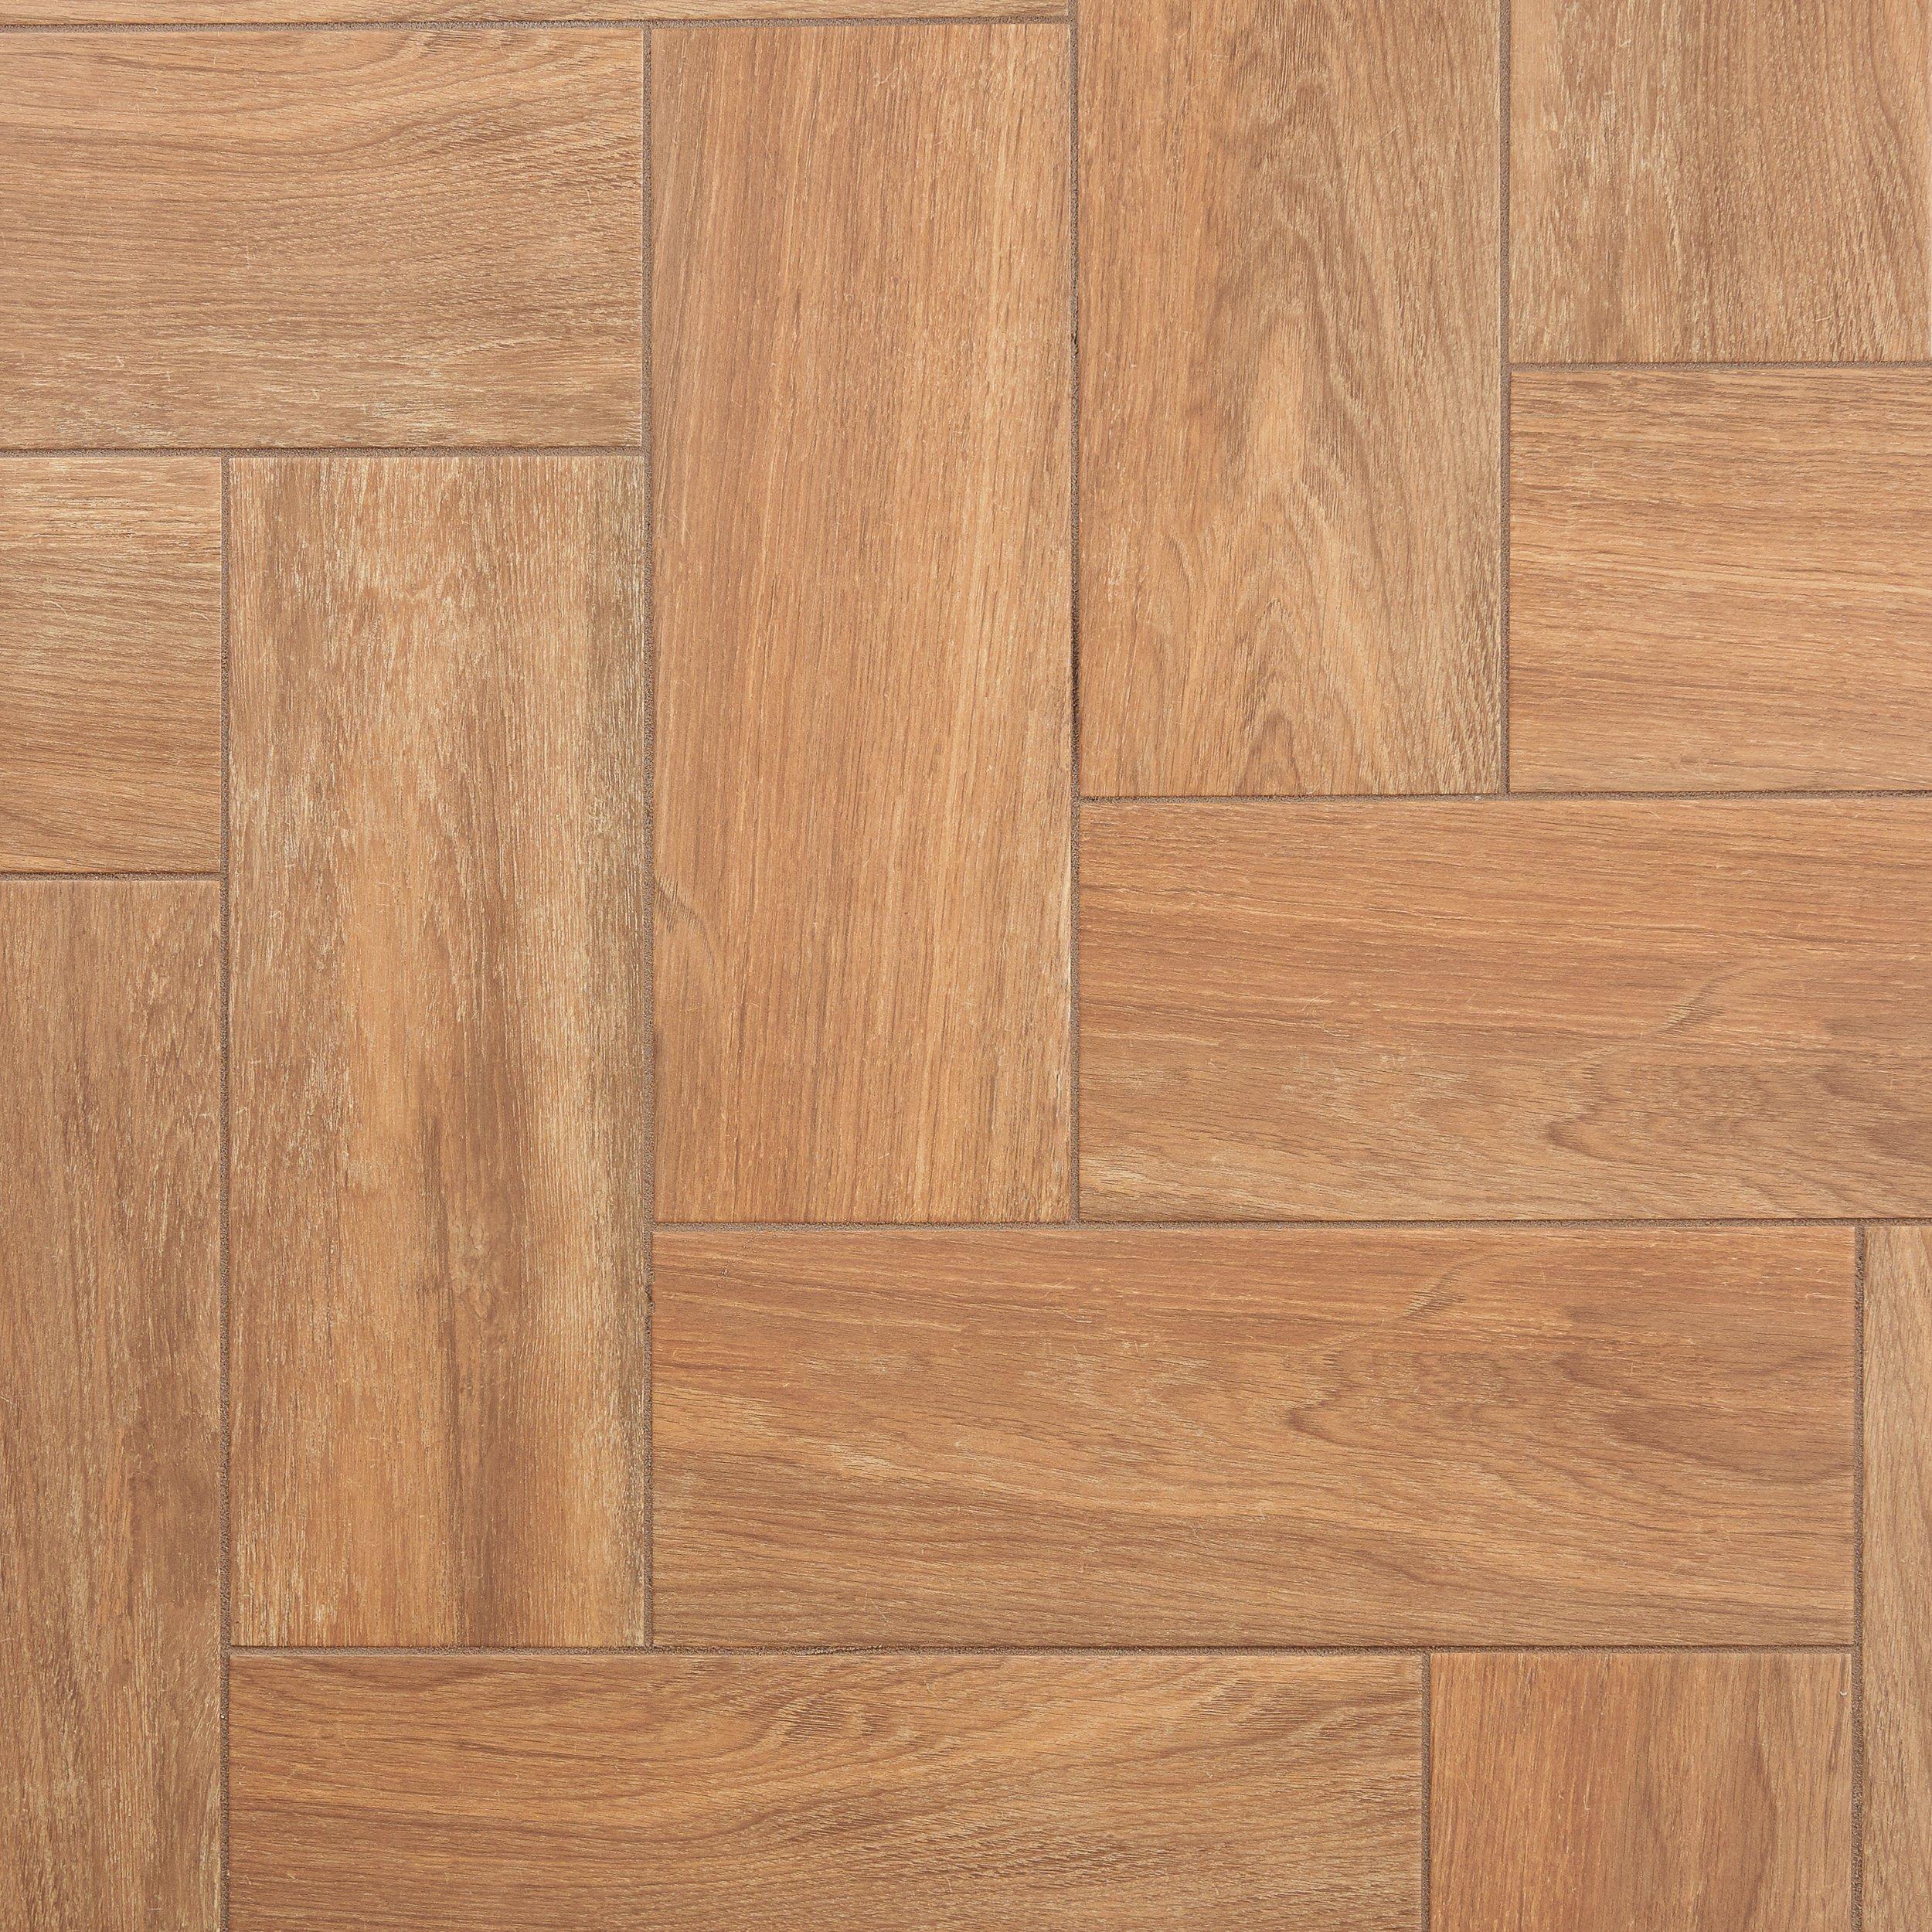 Clearance! Addison Oak Wood Plank Ceramic Tile